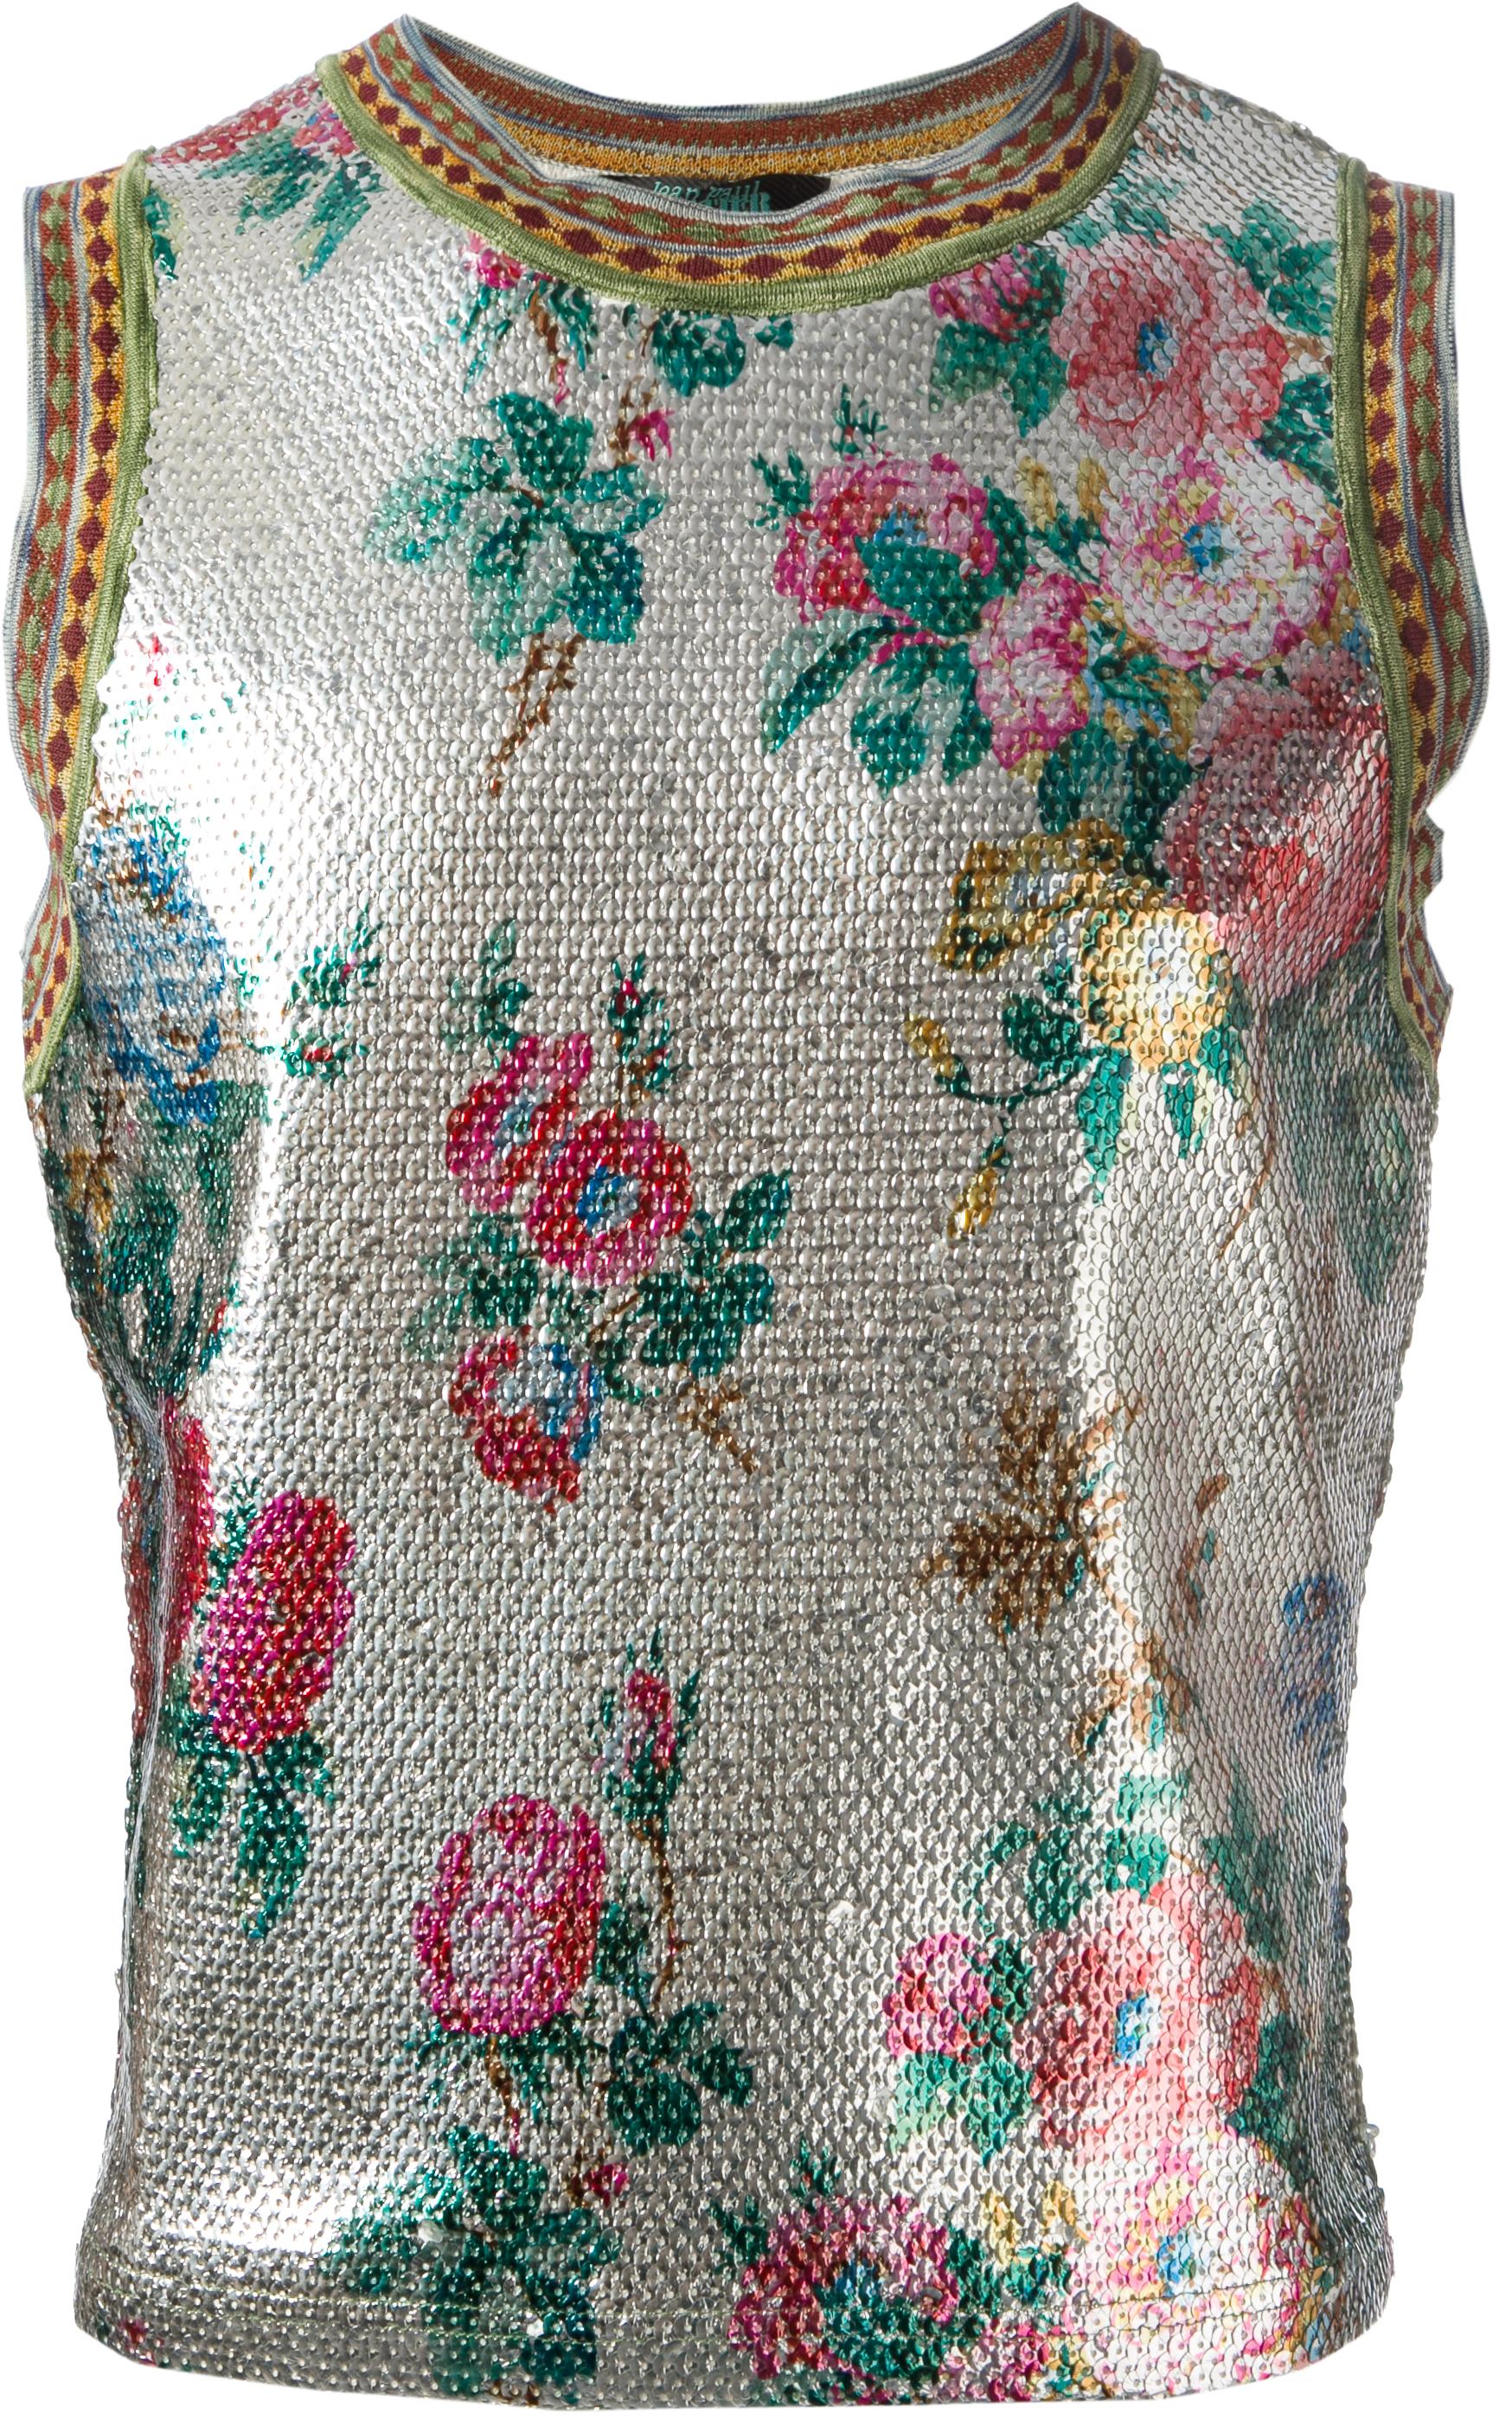 Jean Paul Gaultier sequin floral top from SS91 collection, Adam et Ève, Rastas d'Aujourd'hui